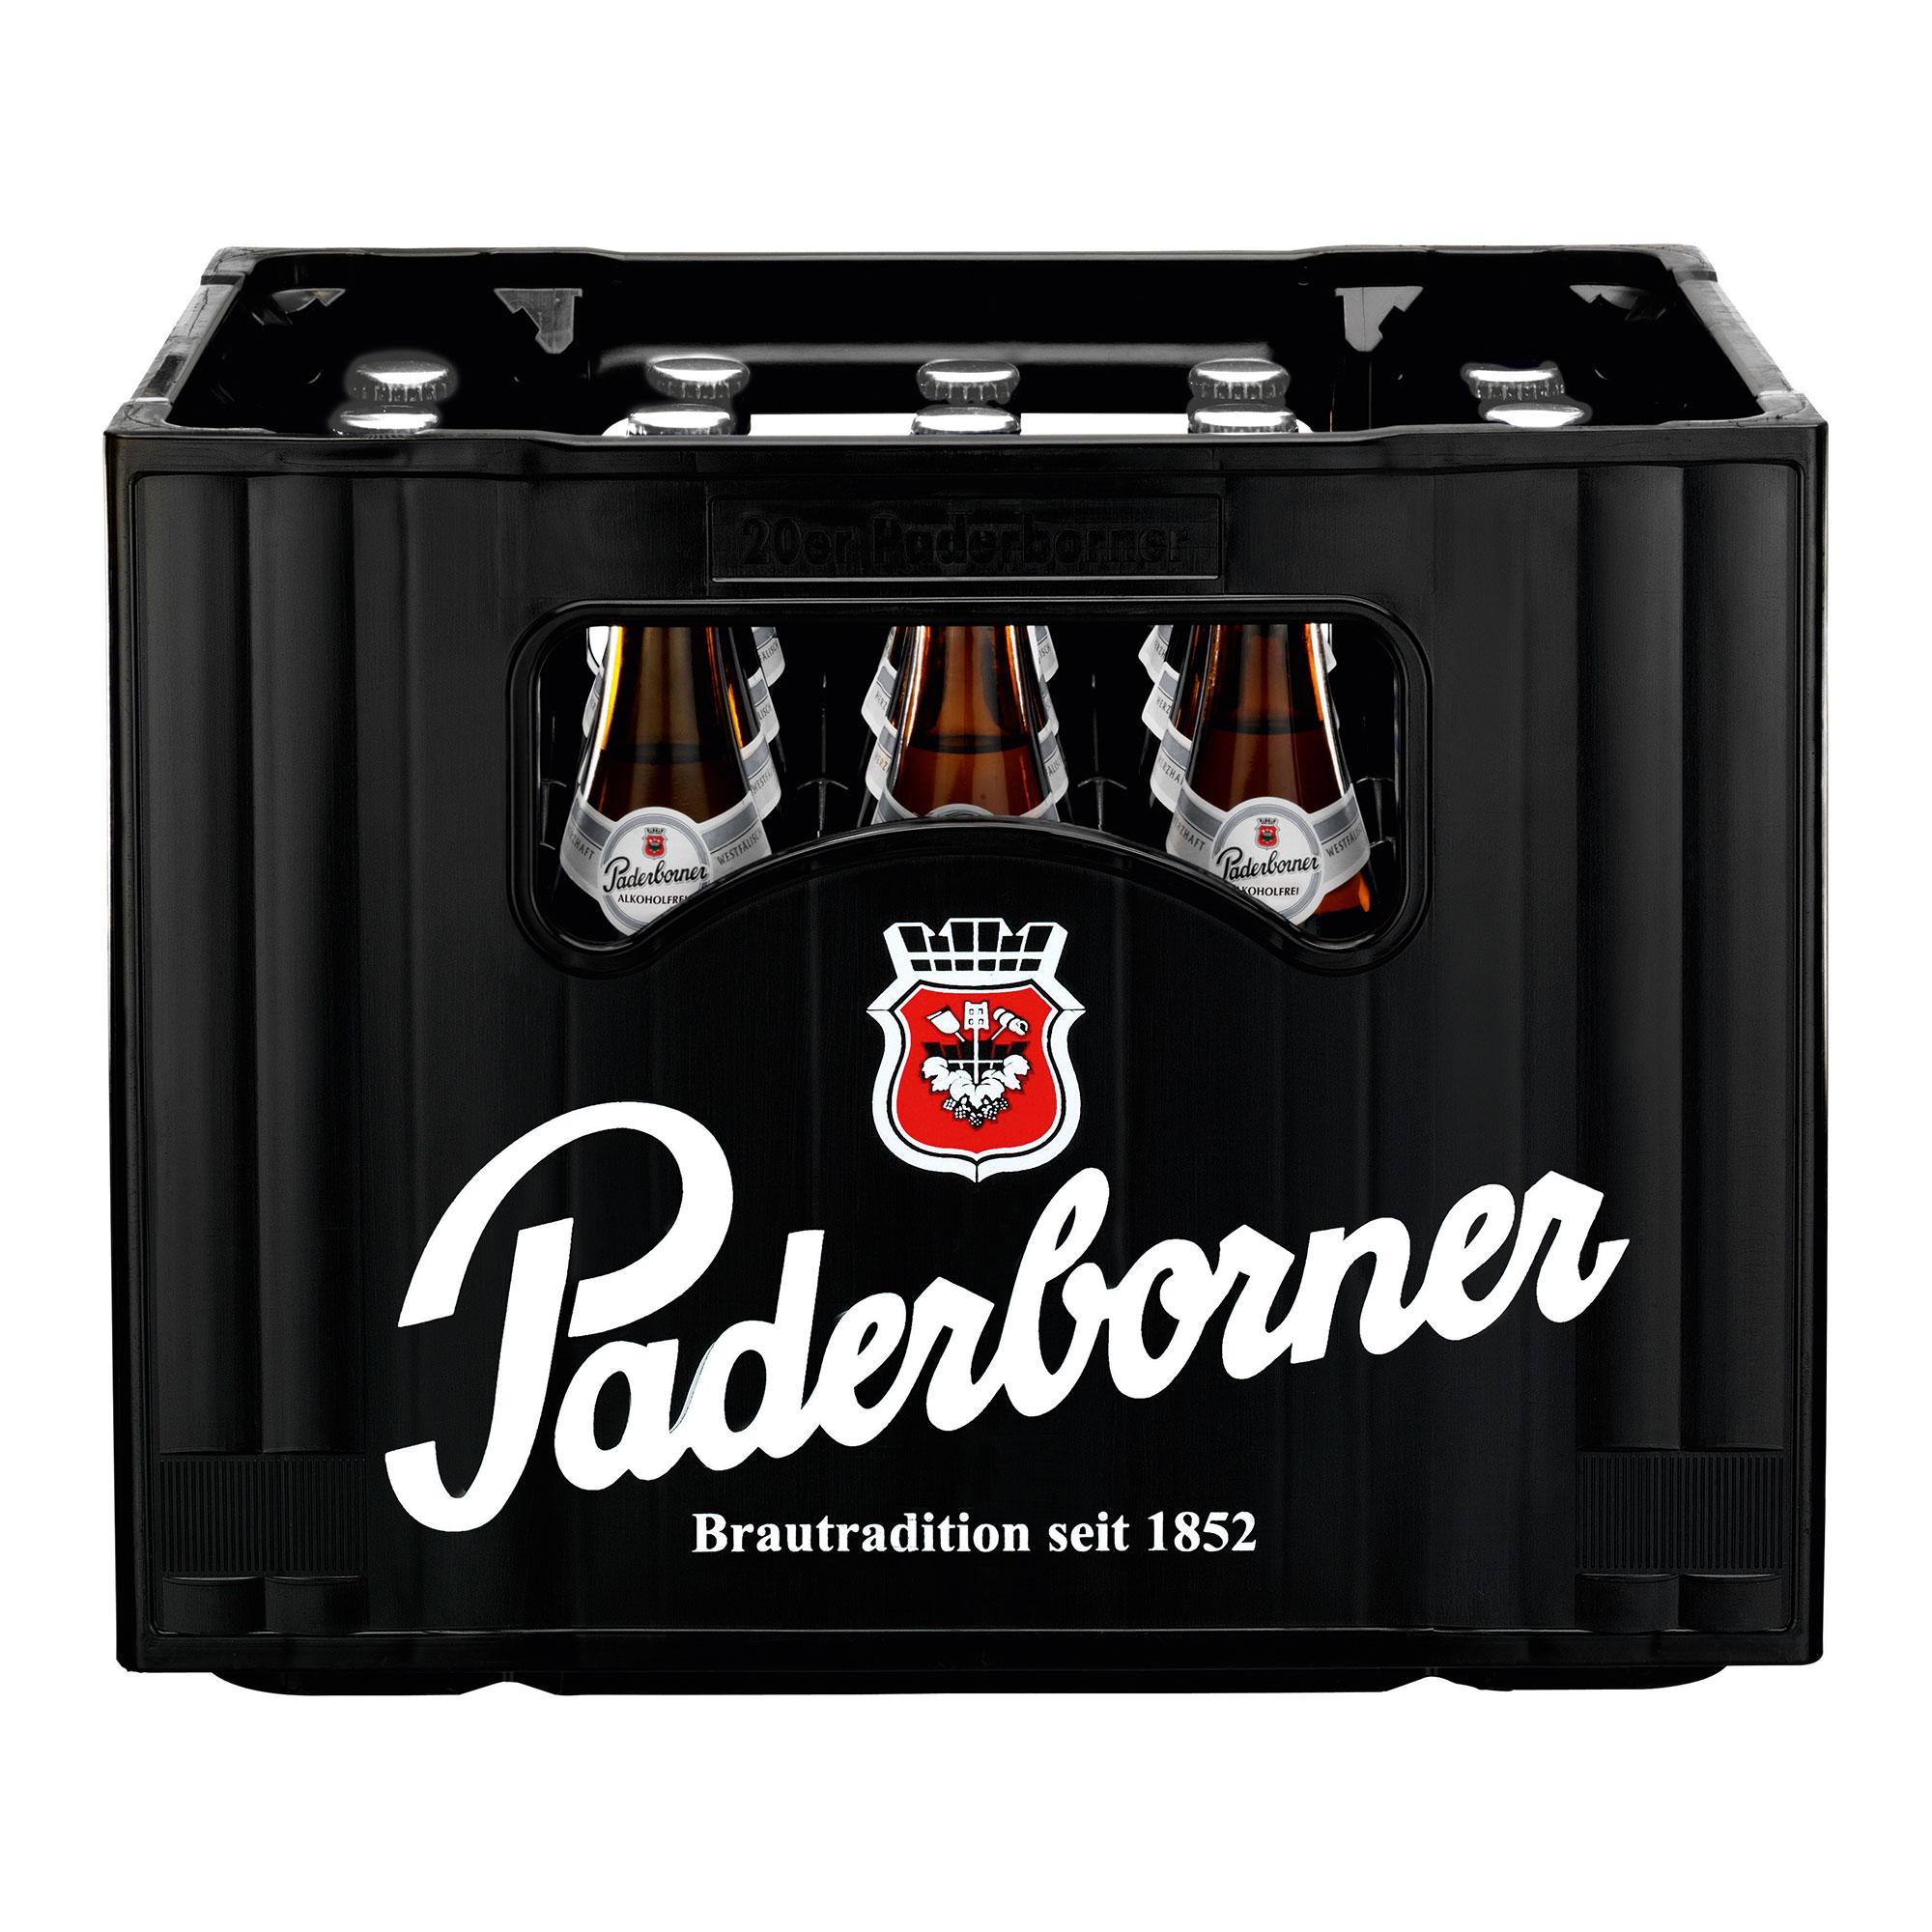 Produktabbildung Paderborner Alkoholfrei Kasten 20 x 0,5 l